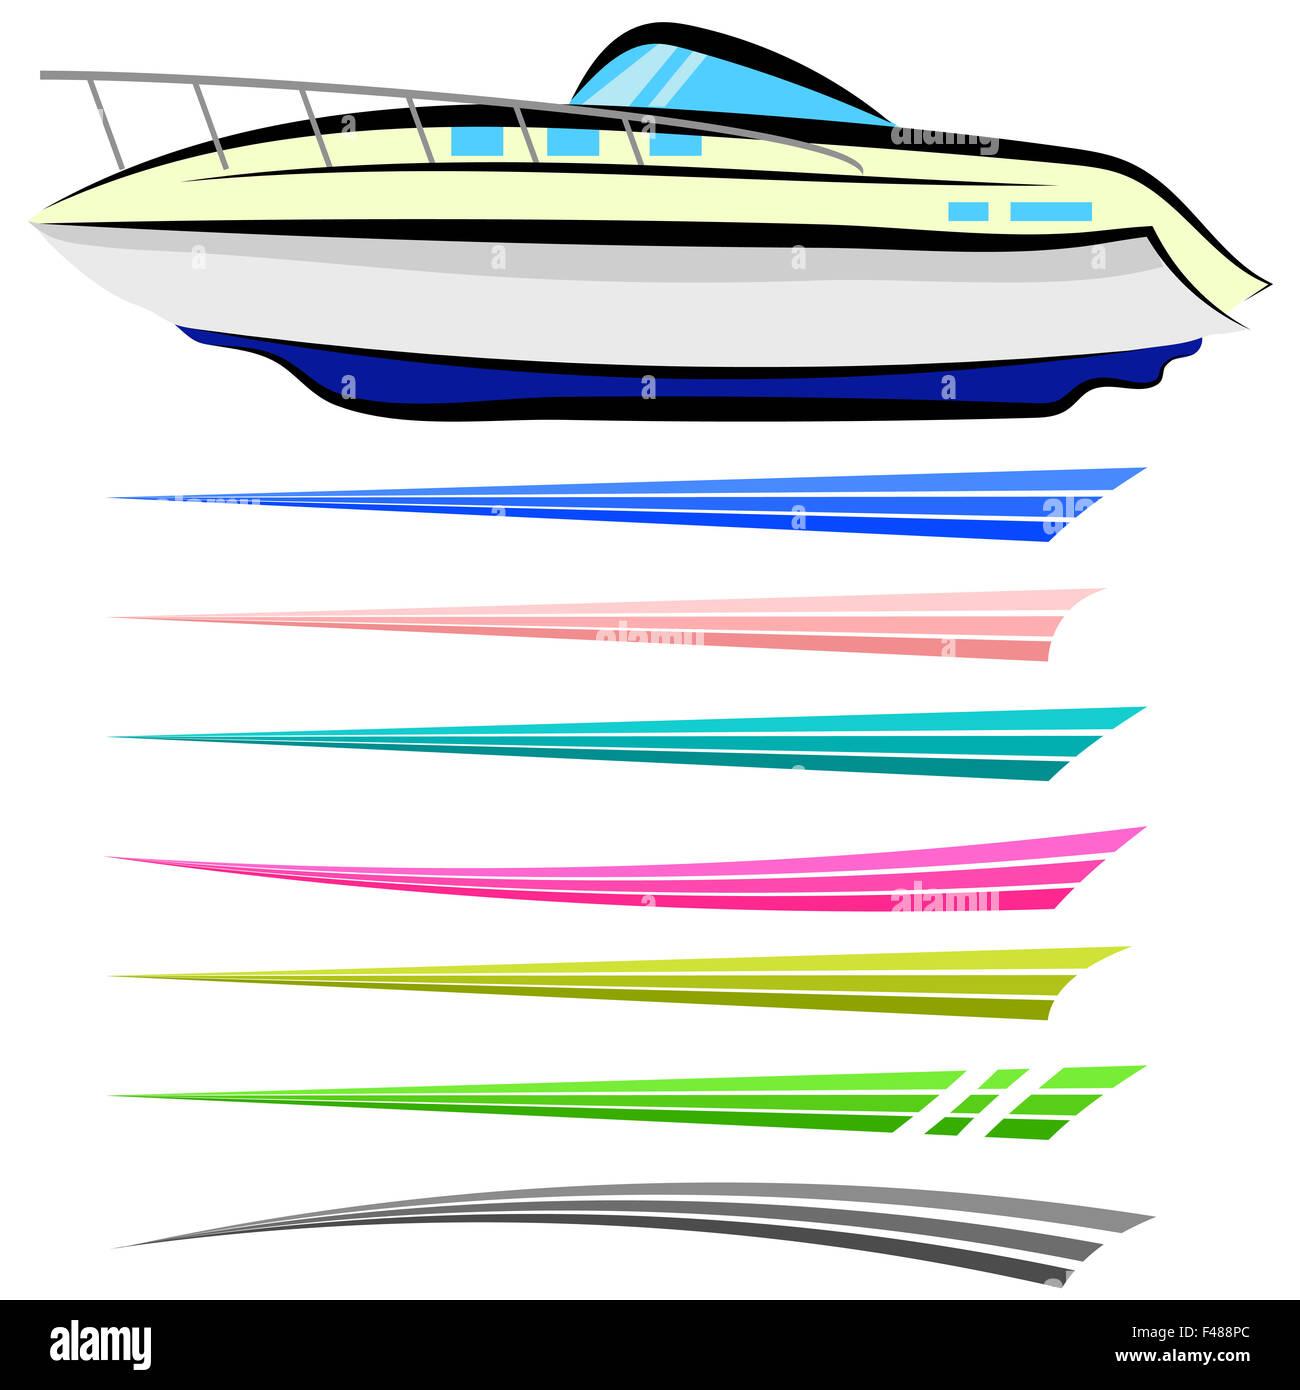 Boat Graphics Stripe Vinyl Ready Stock Photos & Boat